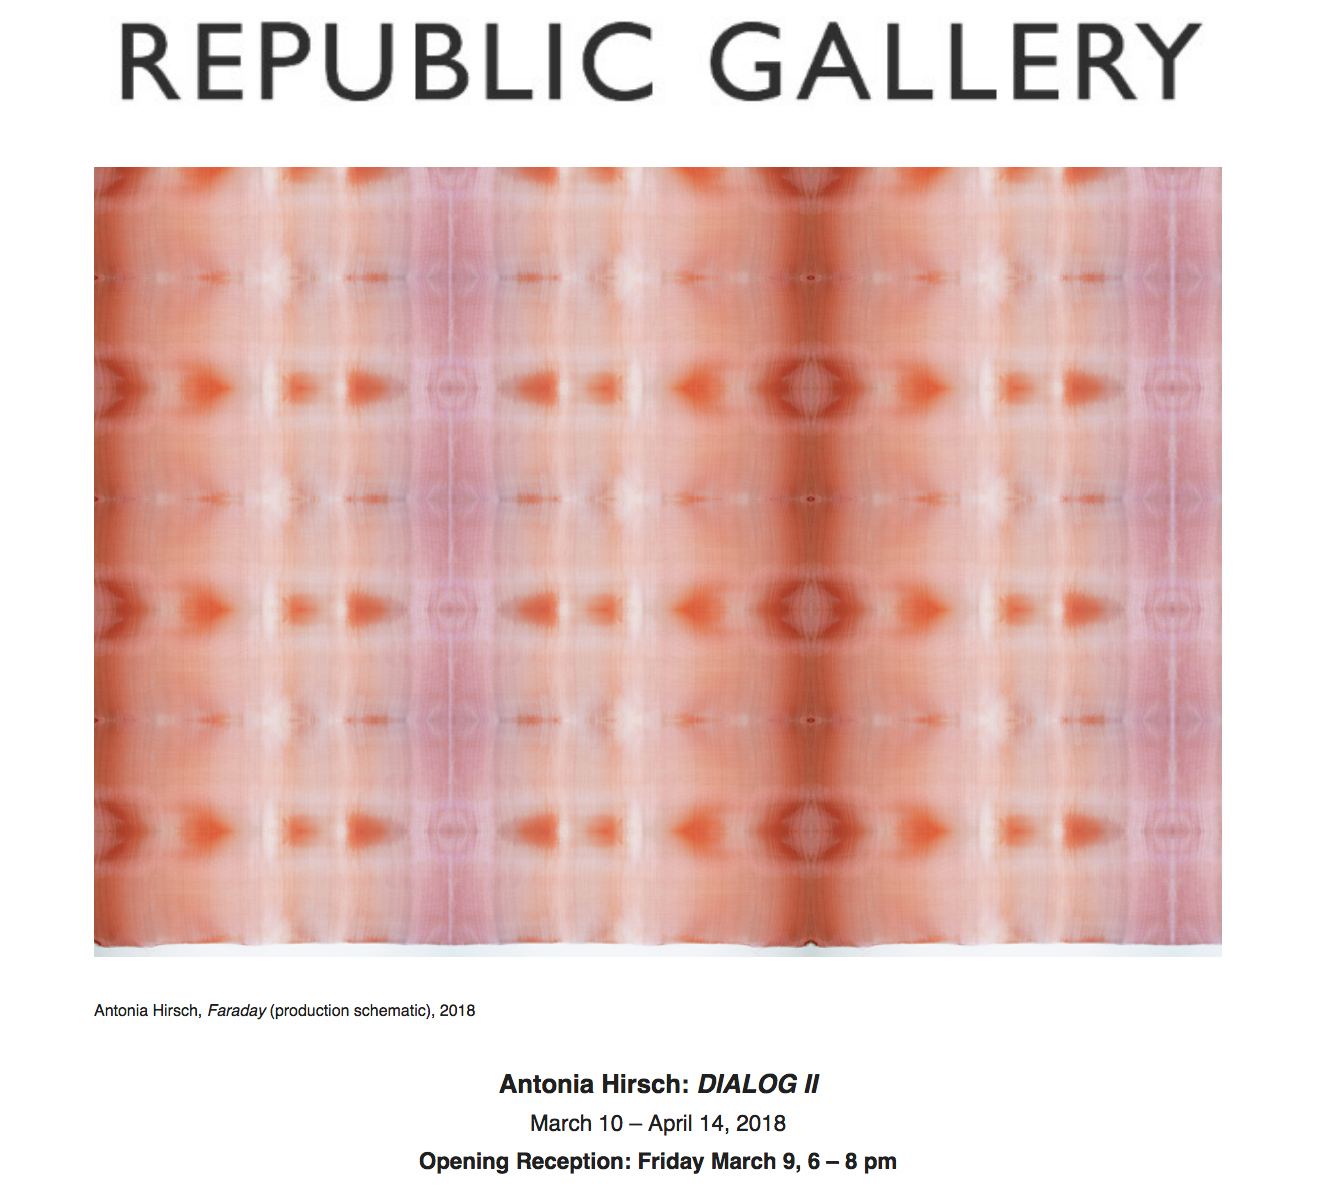 antonia_hirsch_dialog_republic